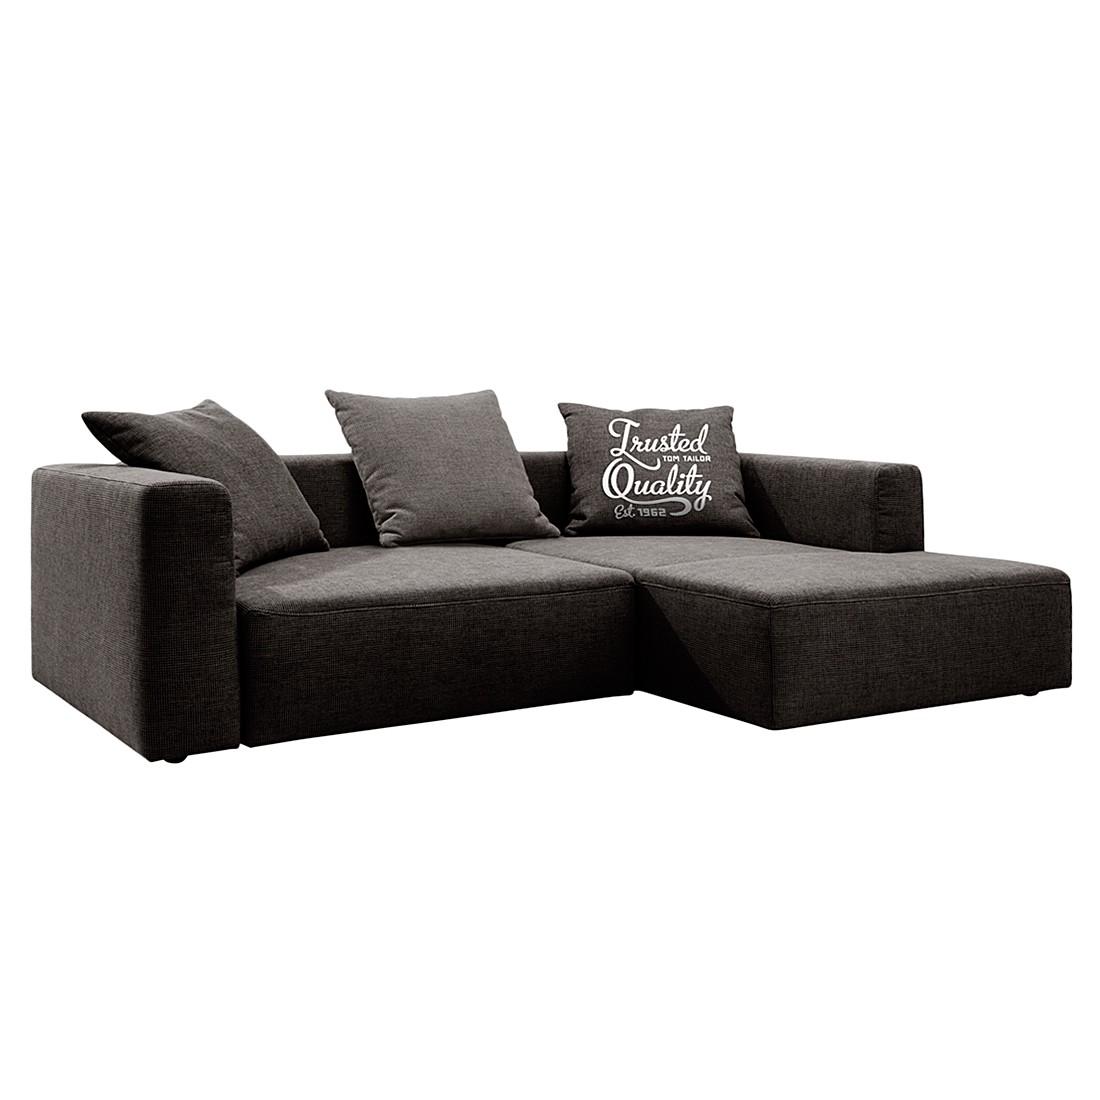 ecksofa heaven casual webstoff longchair ottomane davorstehend rechts ohne schlaffunktion. Black Bedroom Furniture Sets. Home Design Ideas